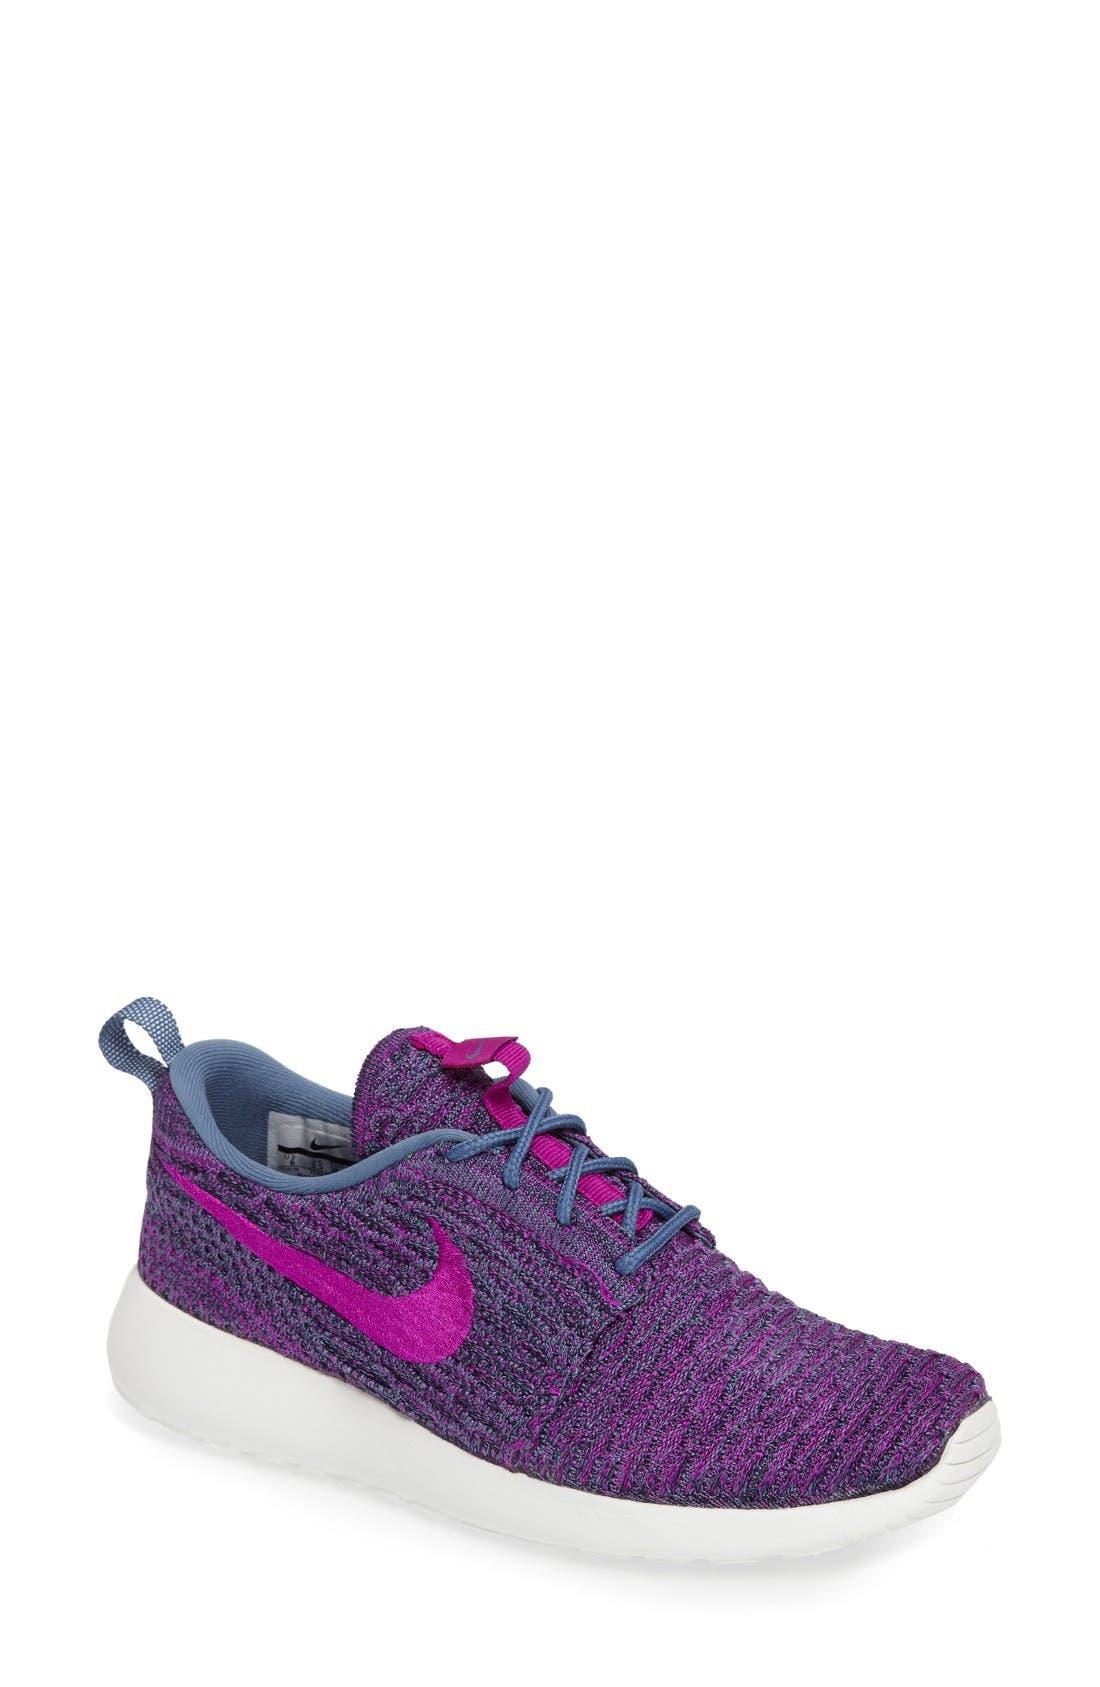 FlyKnit Roshe Run Sneaker,                             Main thumbnail 1, color,                             Ocean Fog/ Vivid Purple